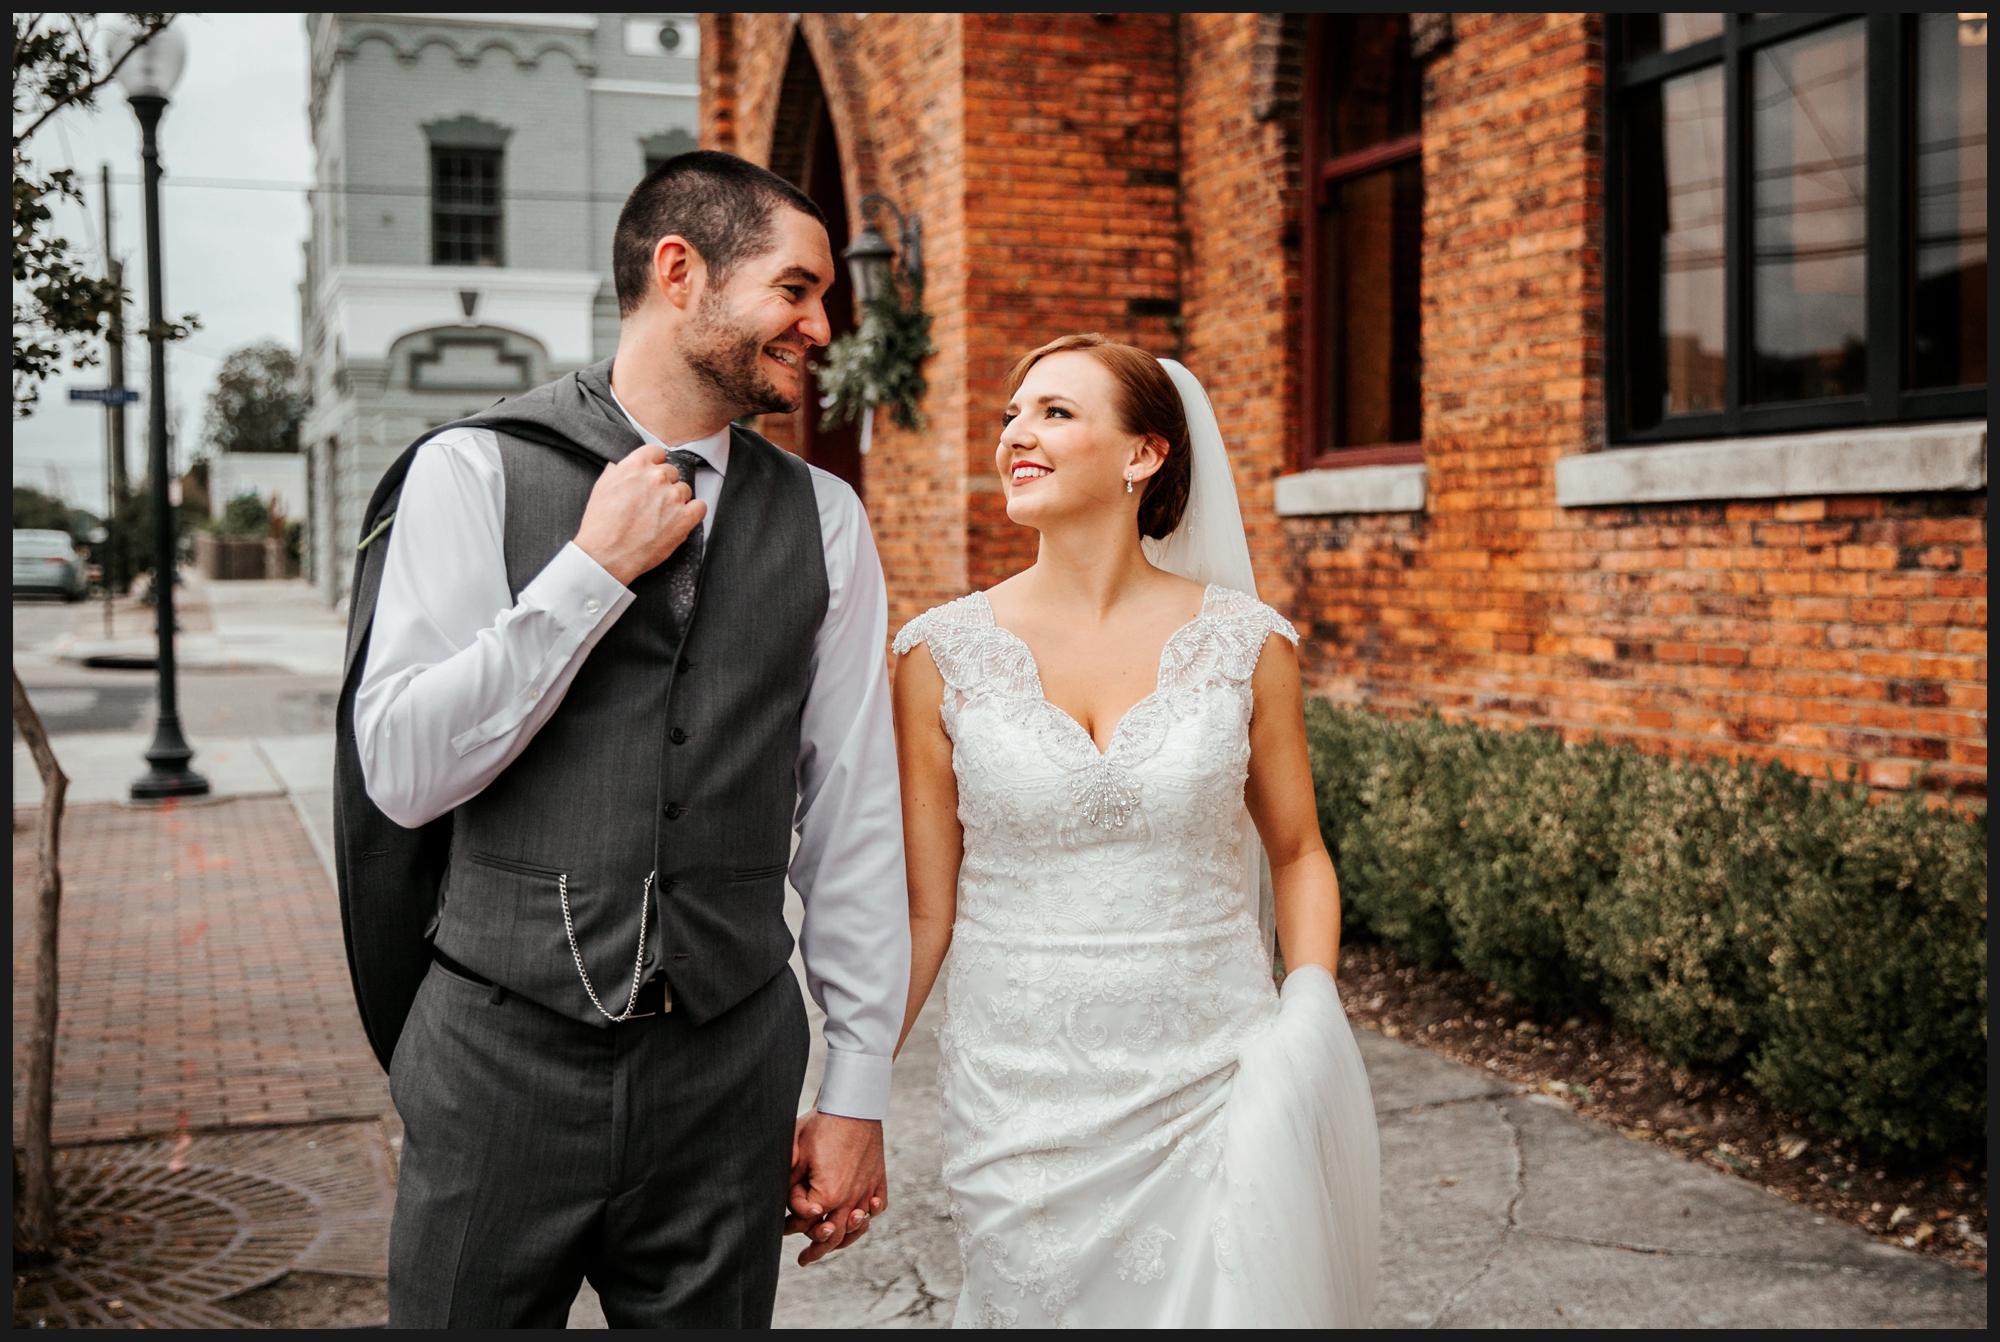 Orlando-Wedding-Photographer-destination-wedding-photographer-florida-wedding-photographer-bohemian-wedding-photographer_0645.jpg